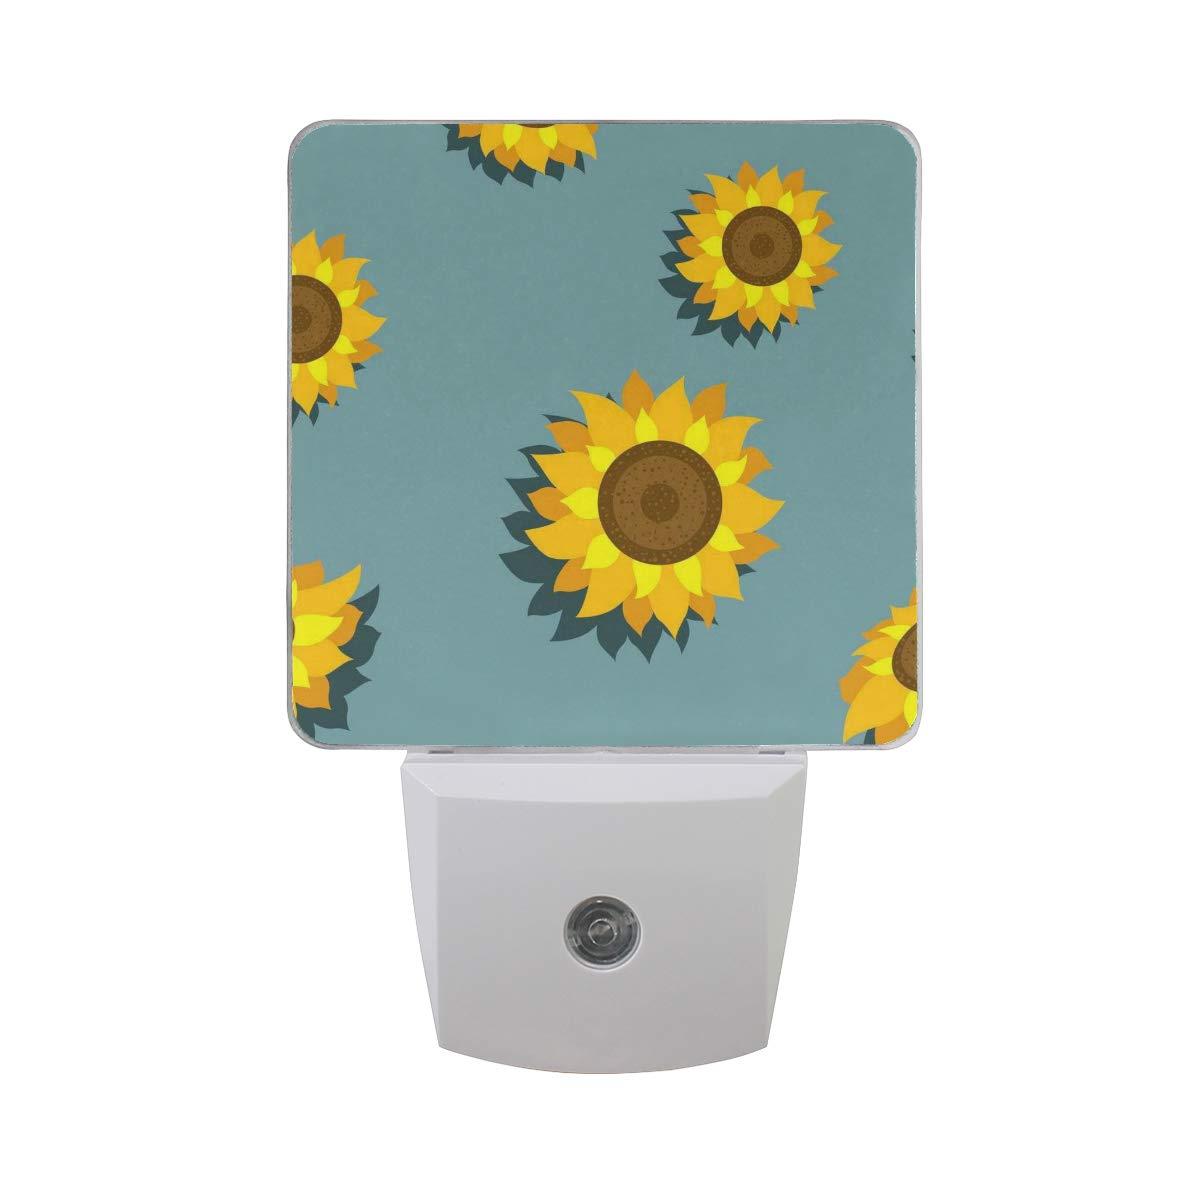 Night Light Blue Sunflower Led Light Lamp for Hallway, Kitchen, Bathroom, Bedroom, Stairs, DaylightWhite, Bedroom, Compact